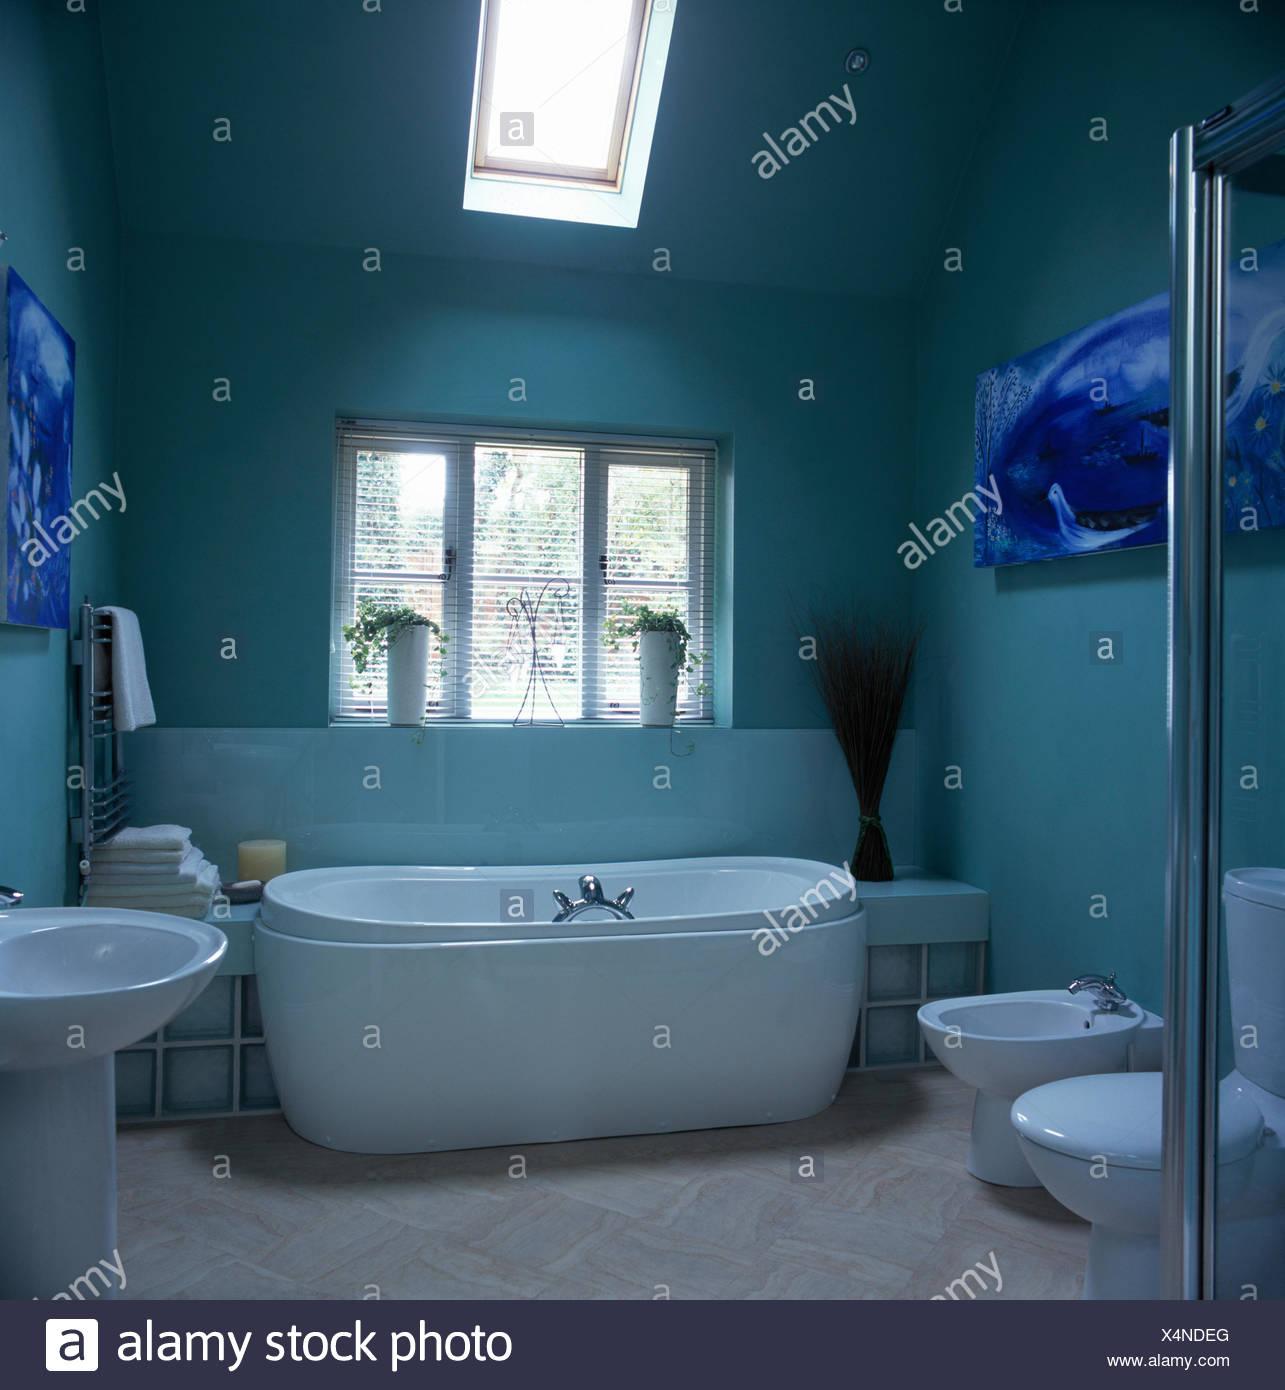 Freestanding Bathtub Stock Photos & Freestanding Bathtub Stock ...